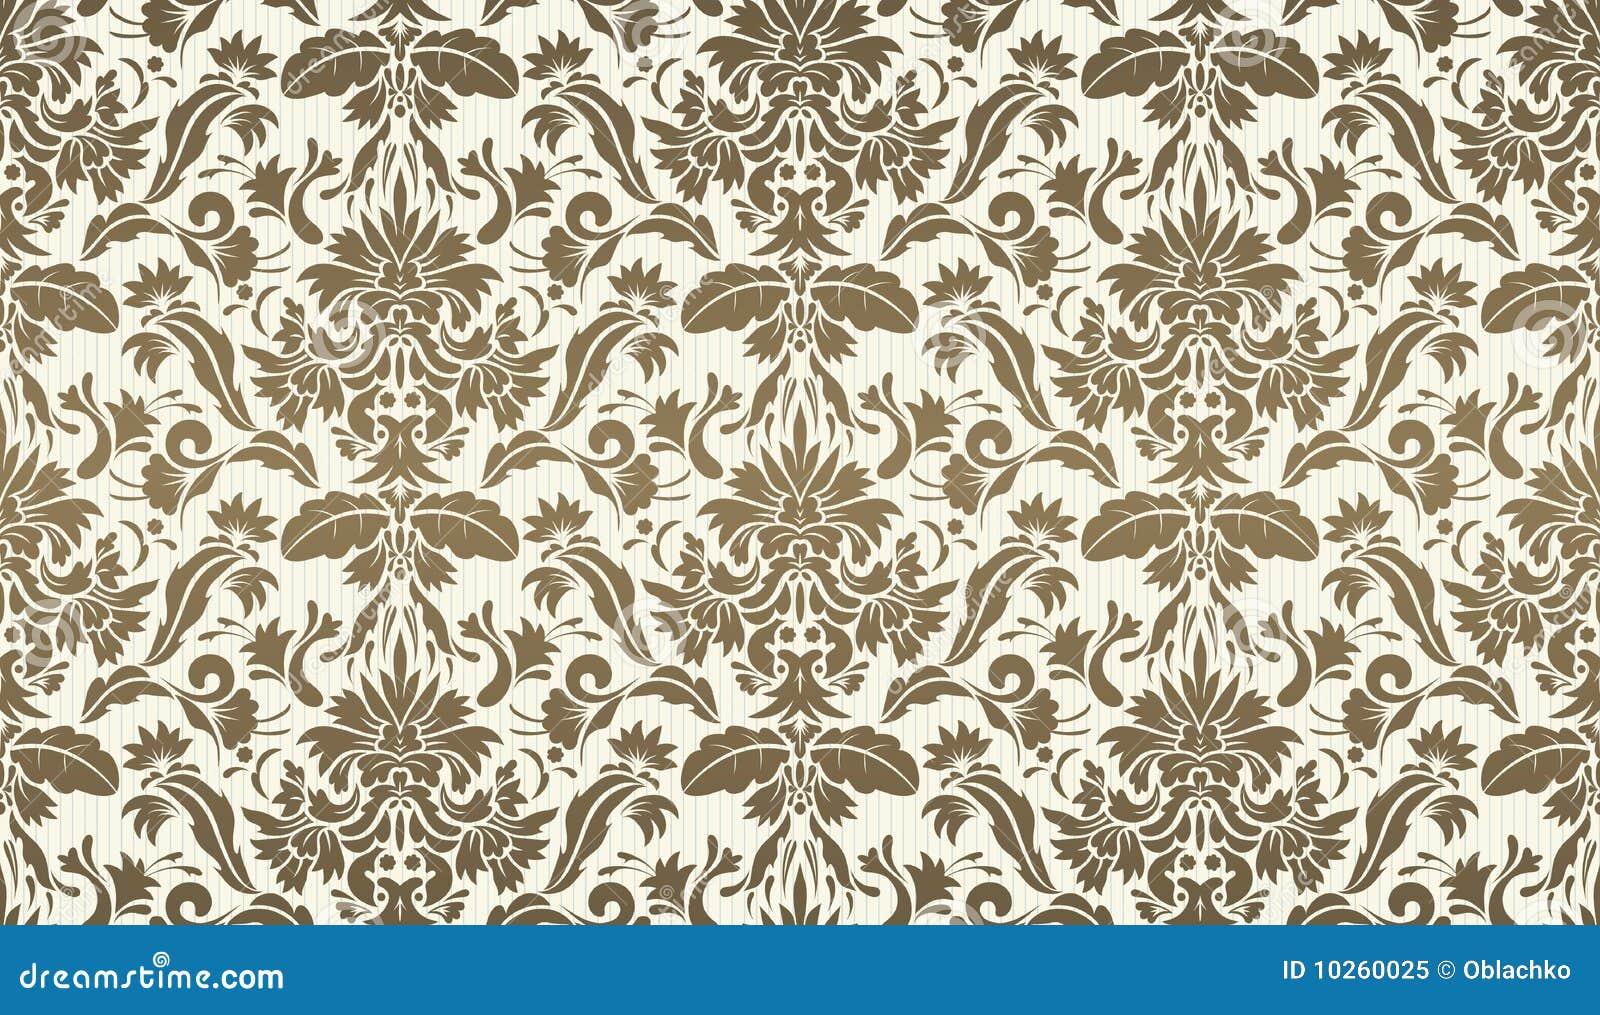 decorative wallpaper background royalty free stock photo